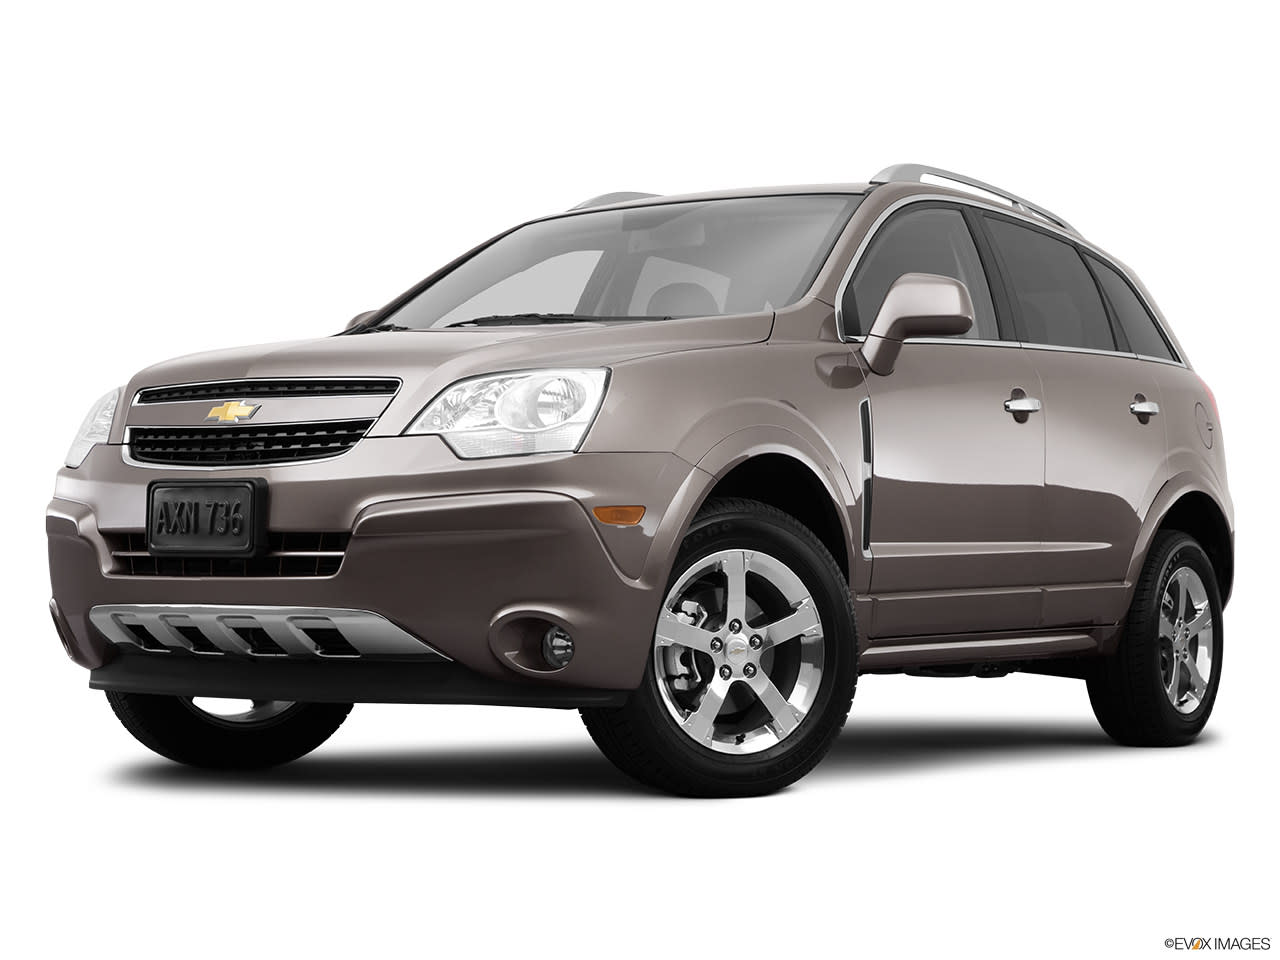 Kelebihan Chevrolet Captiva 2012 Murah Berkualitas